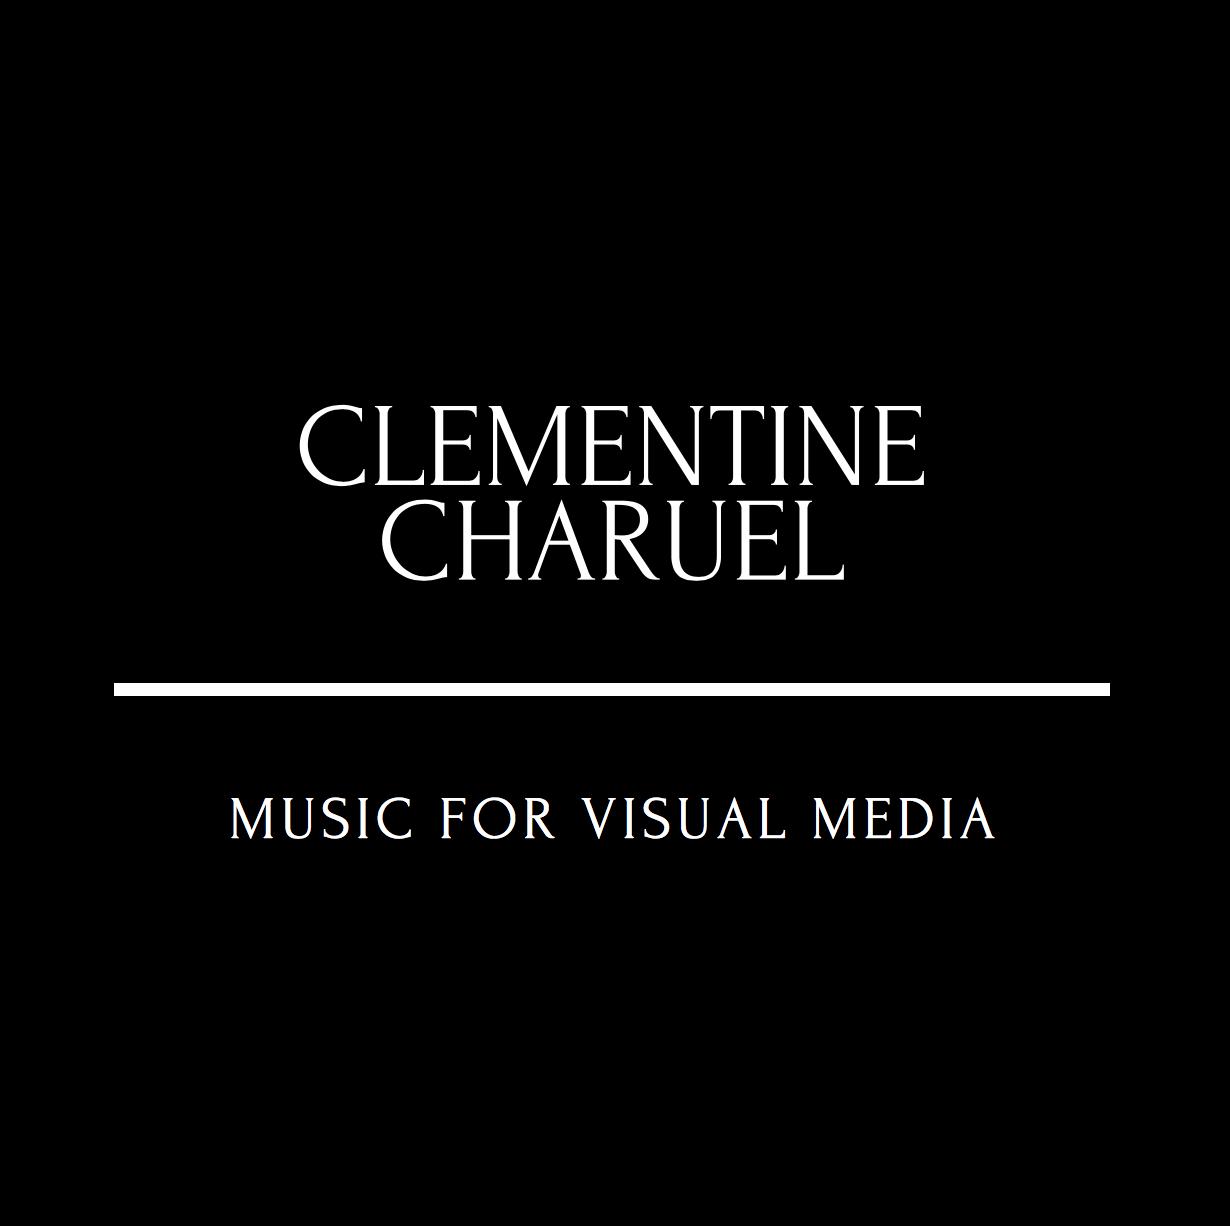 CLEMENTINE CHARUEL